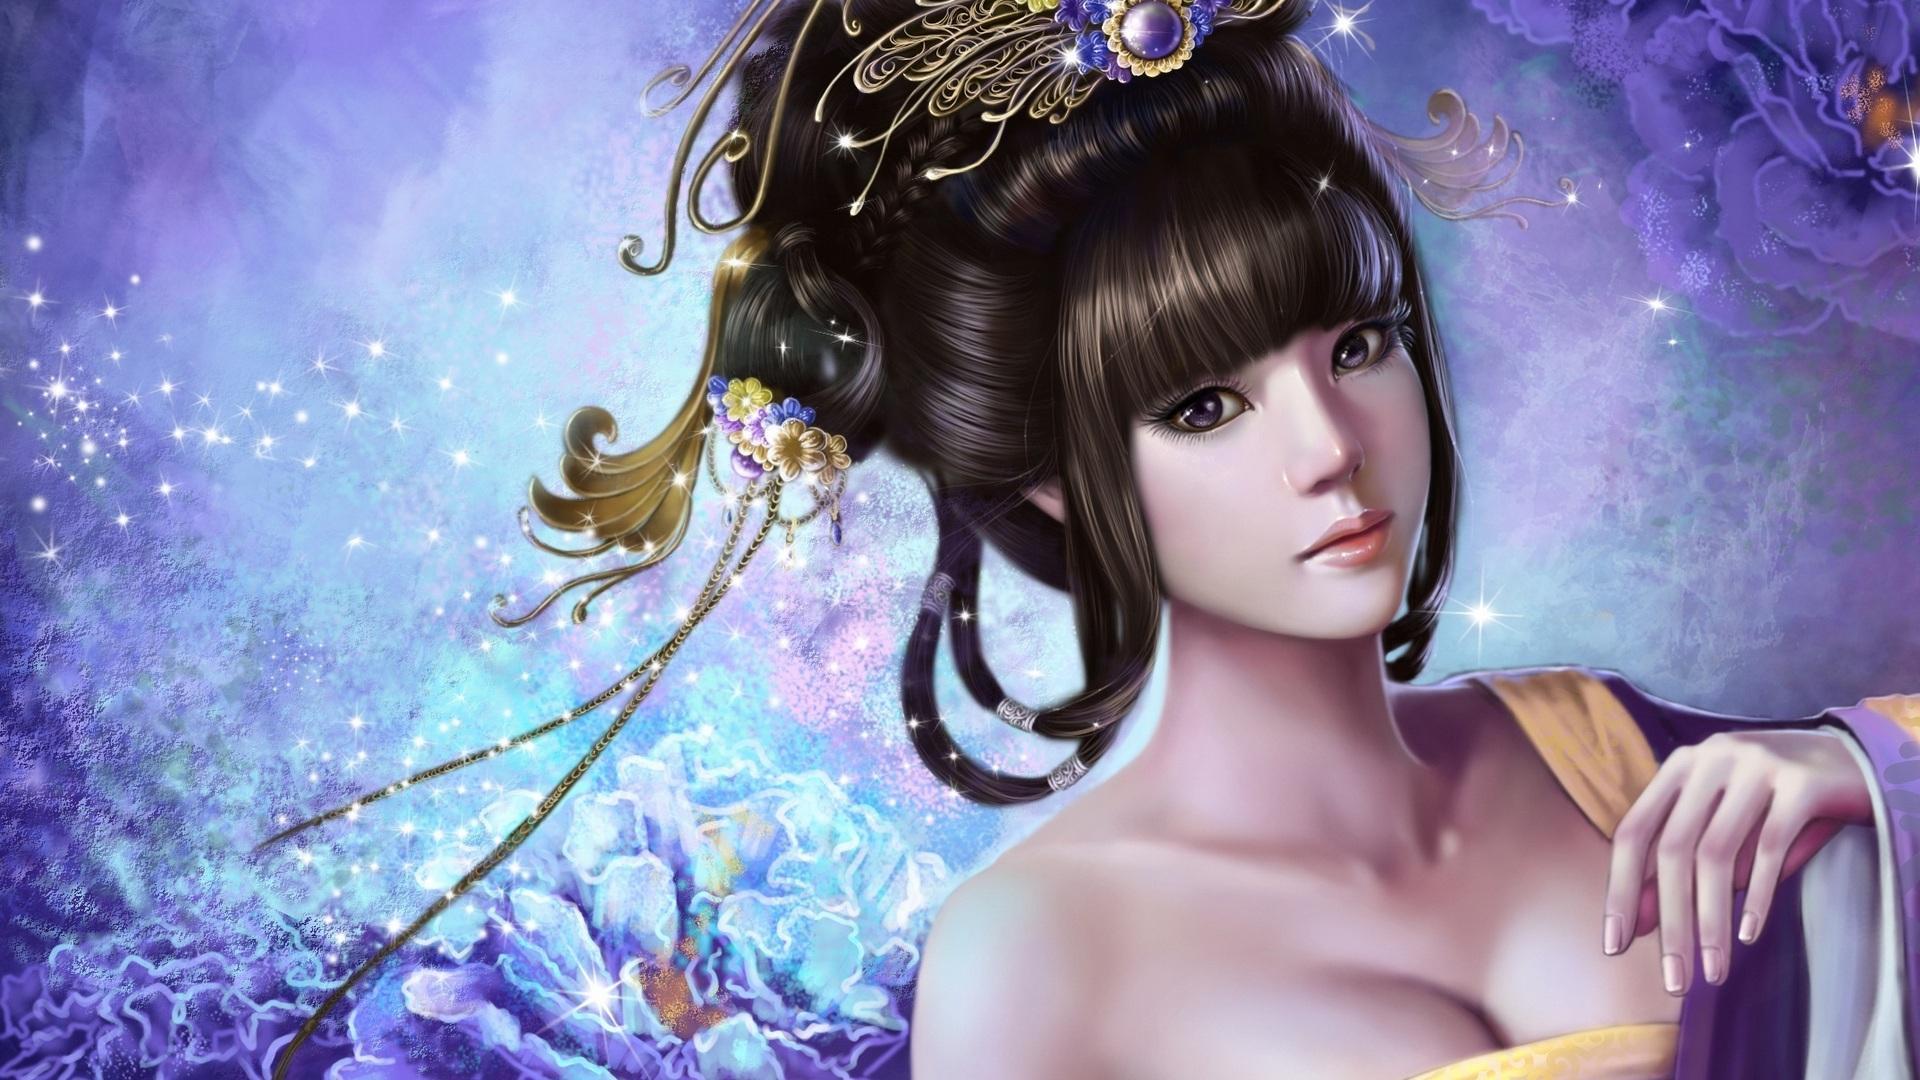 Beautiful anime girls 1920x1080